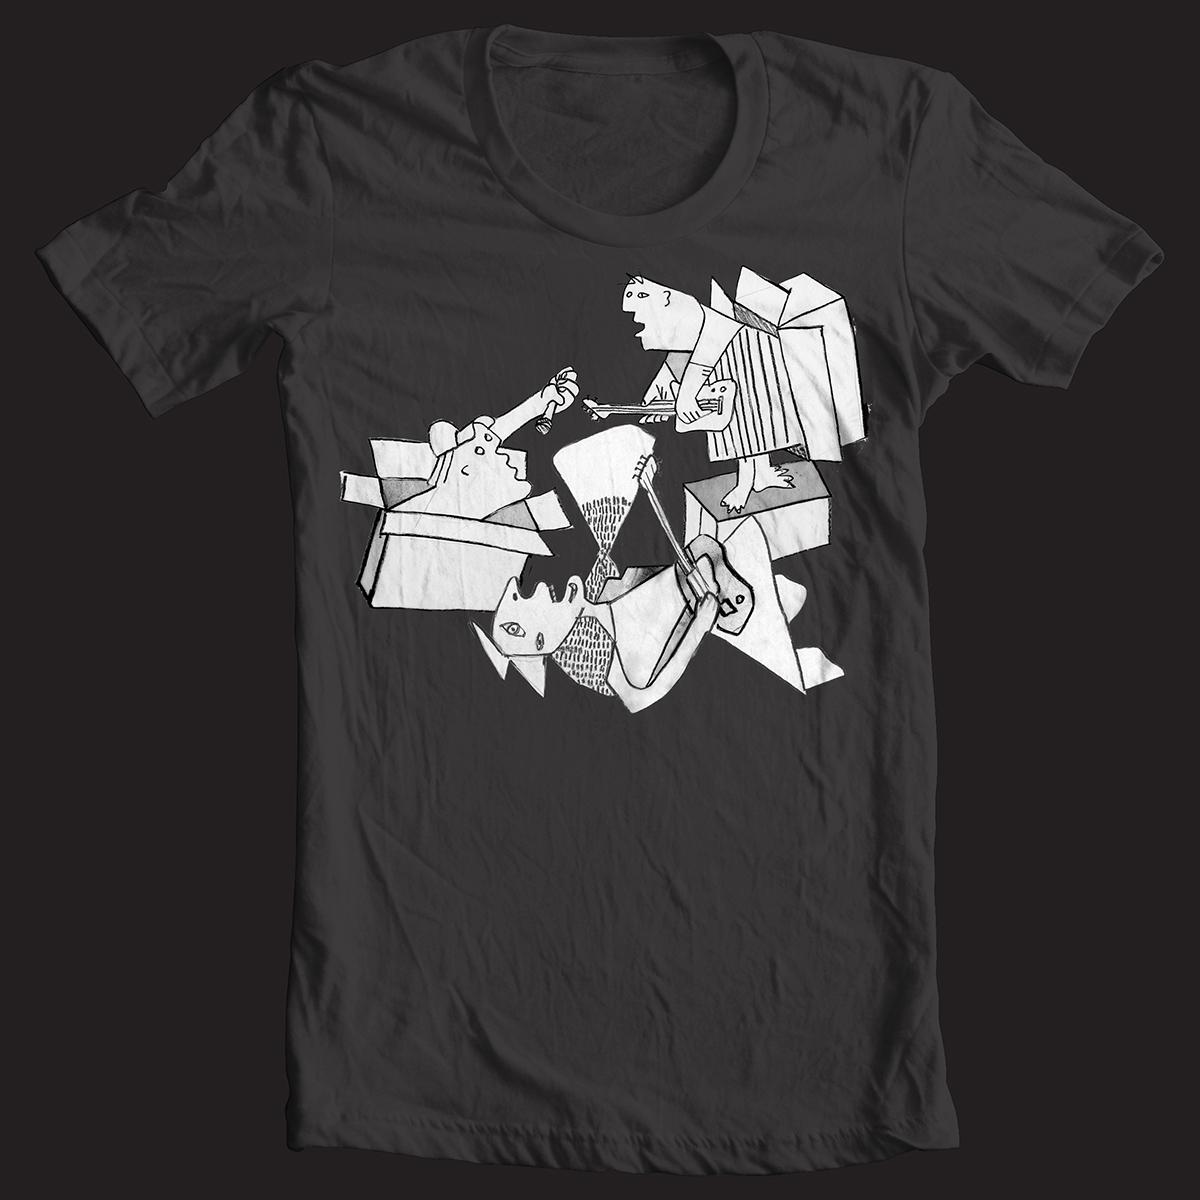 shirt_boxman_2.jpg